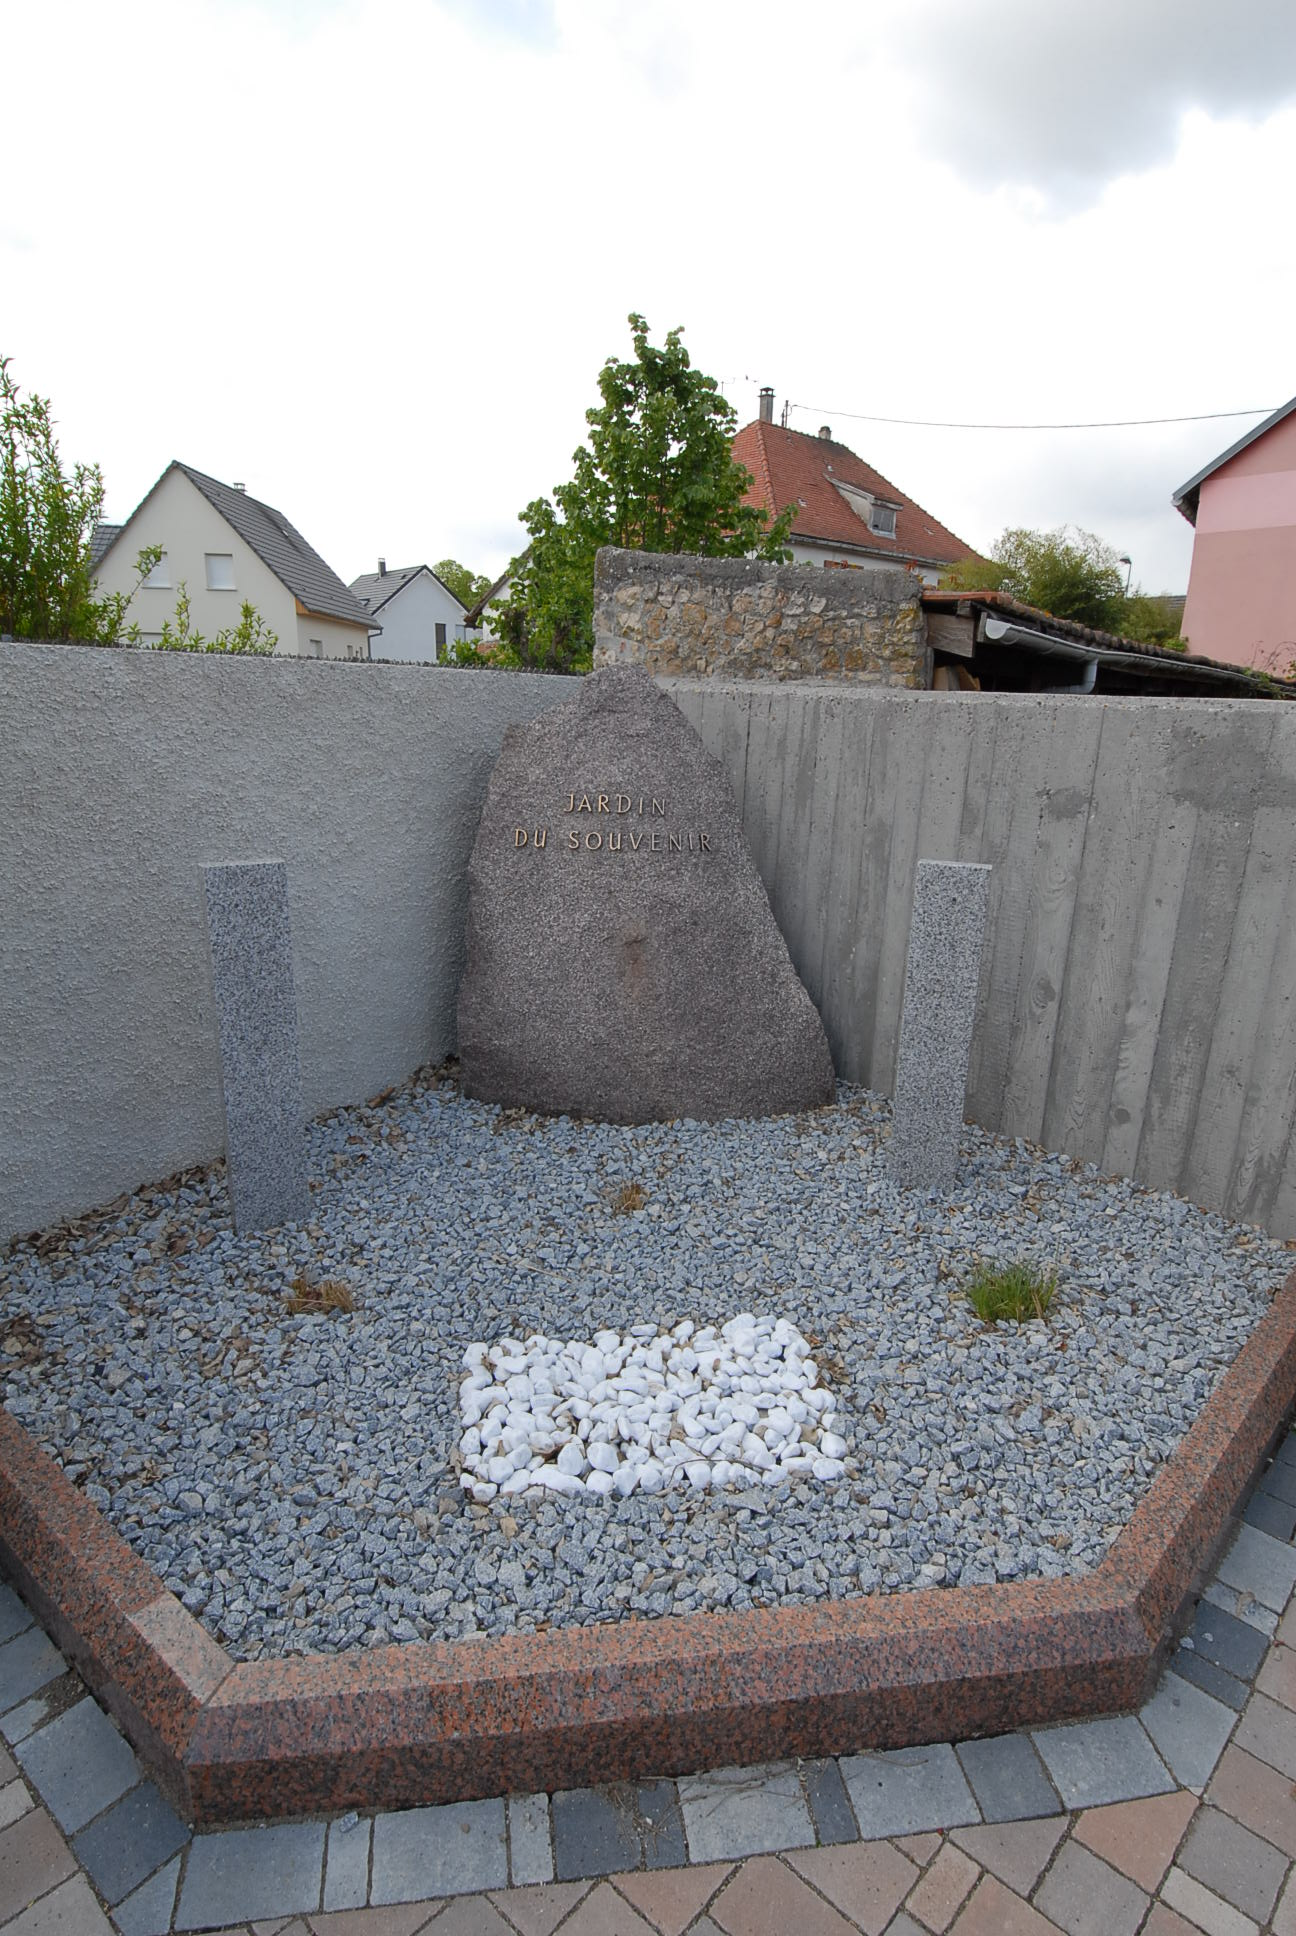 Jardin du souvenir Volgelsheim